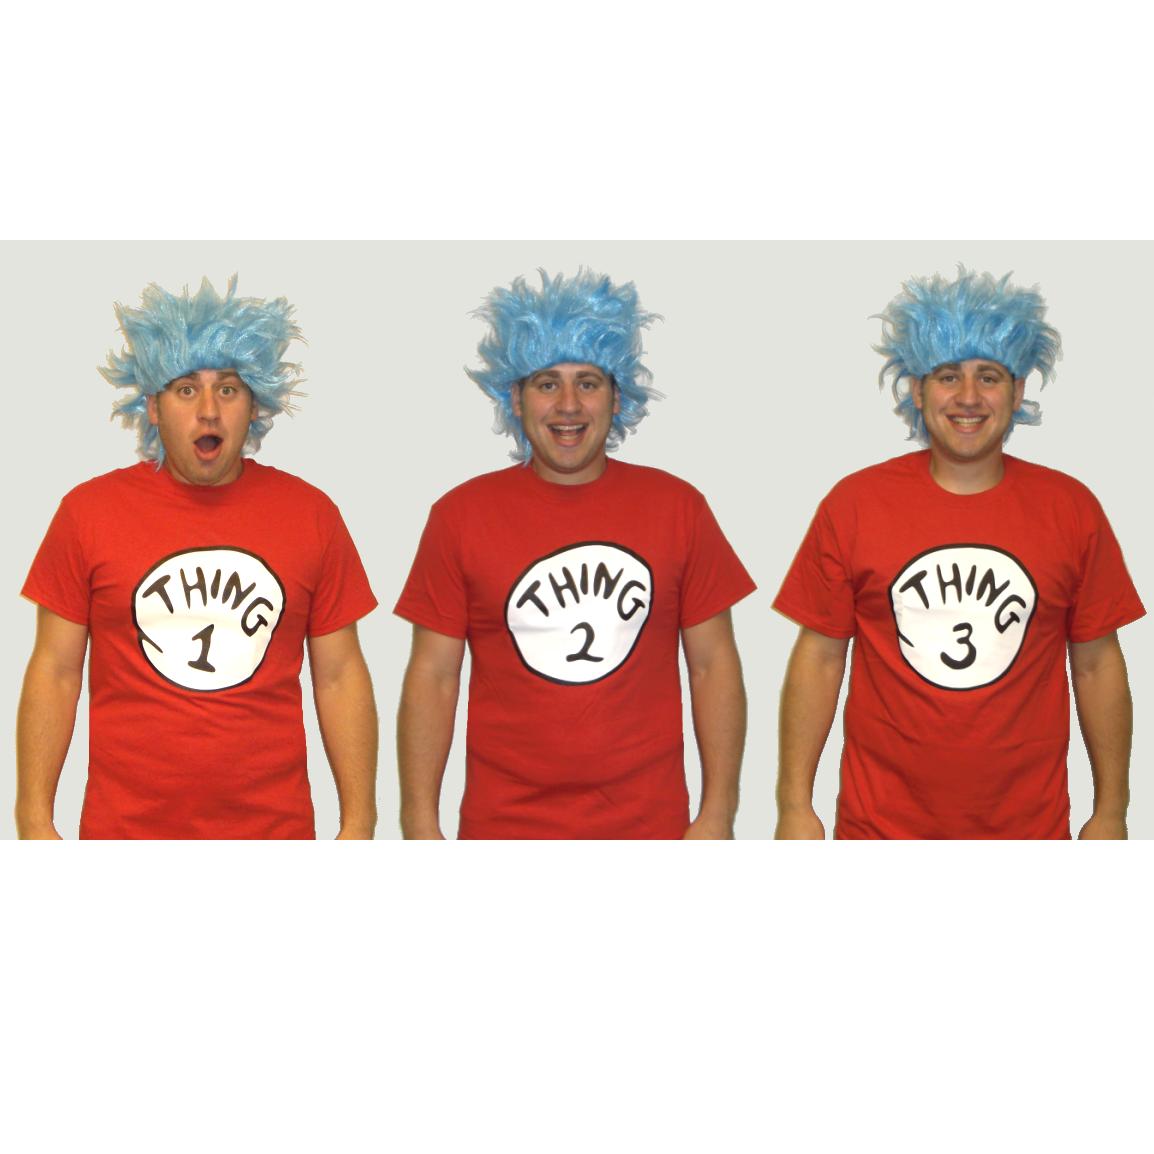 How to Fold a Shirt  Stopfornothingcom Funny Stuff